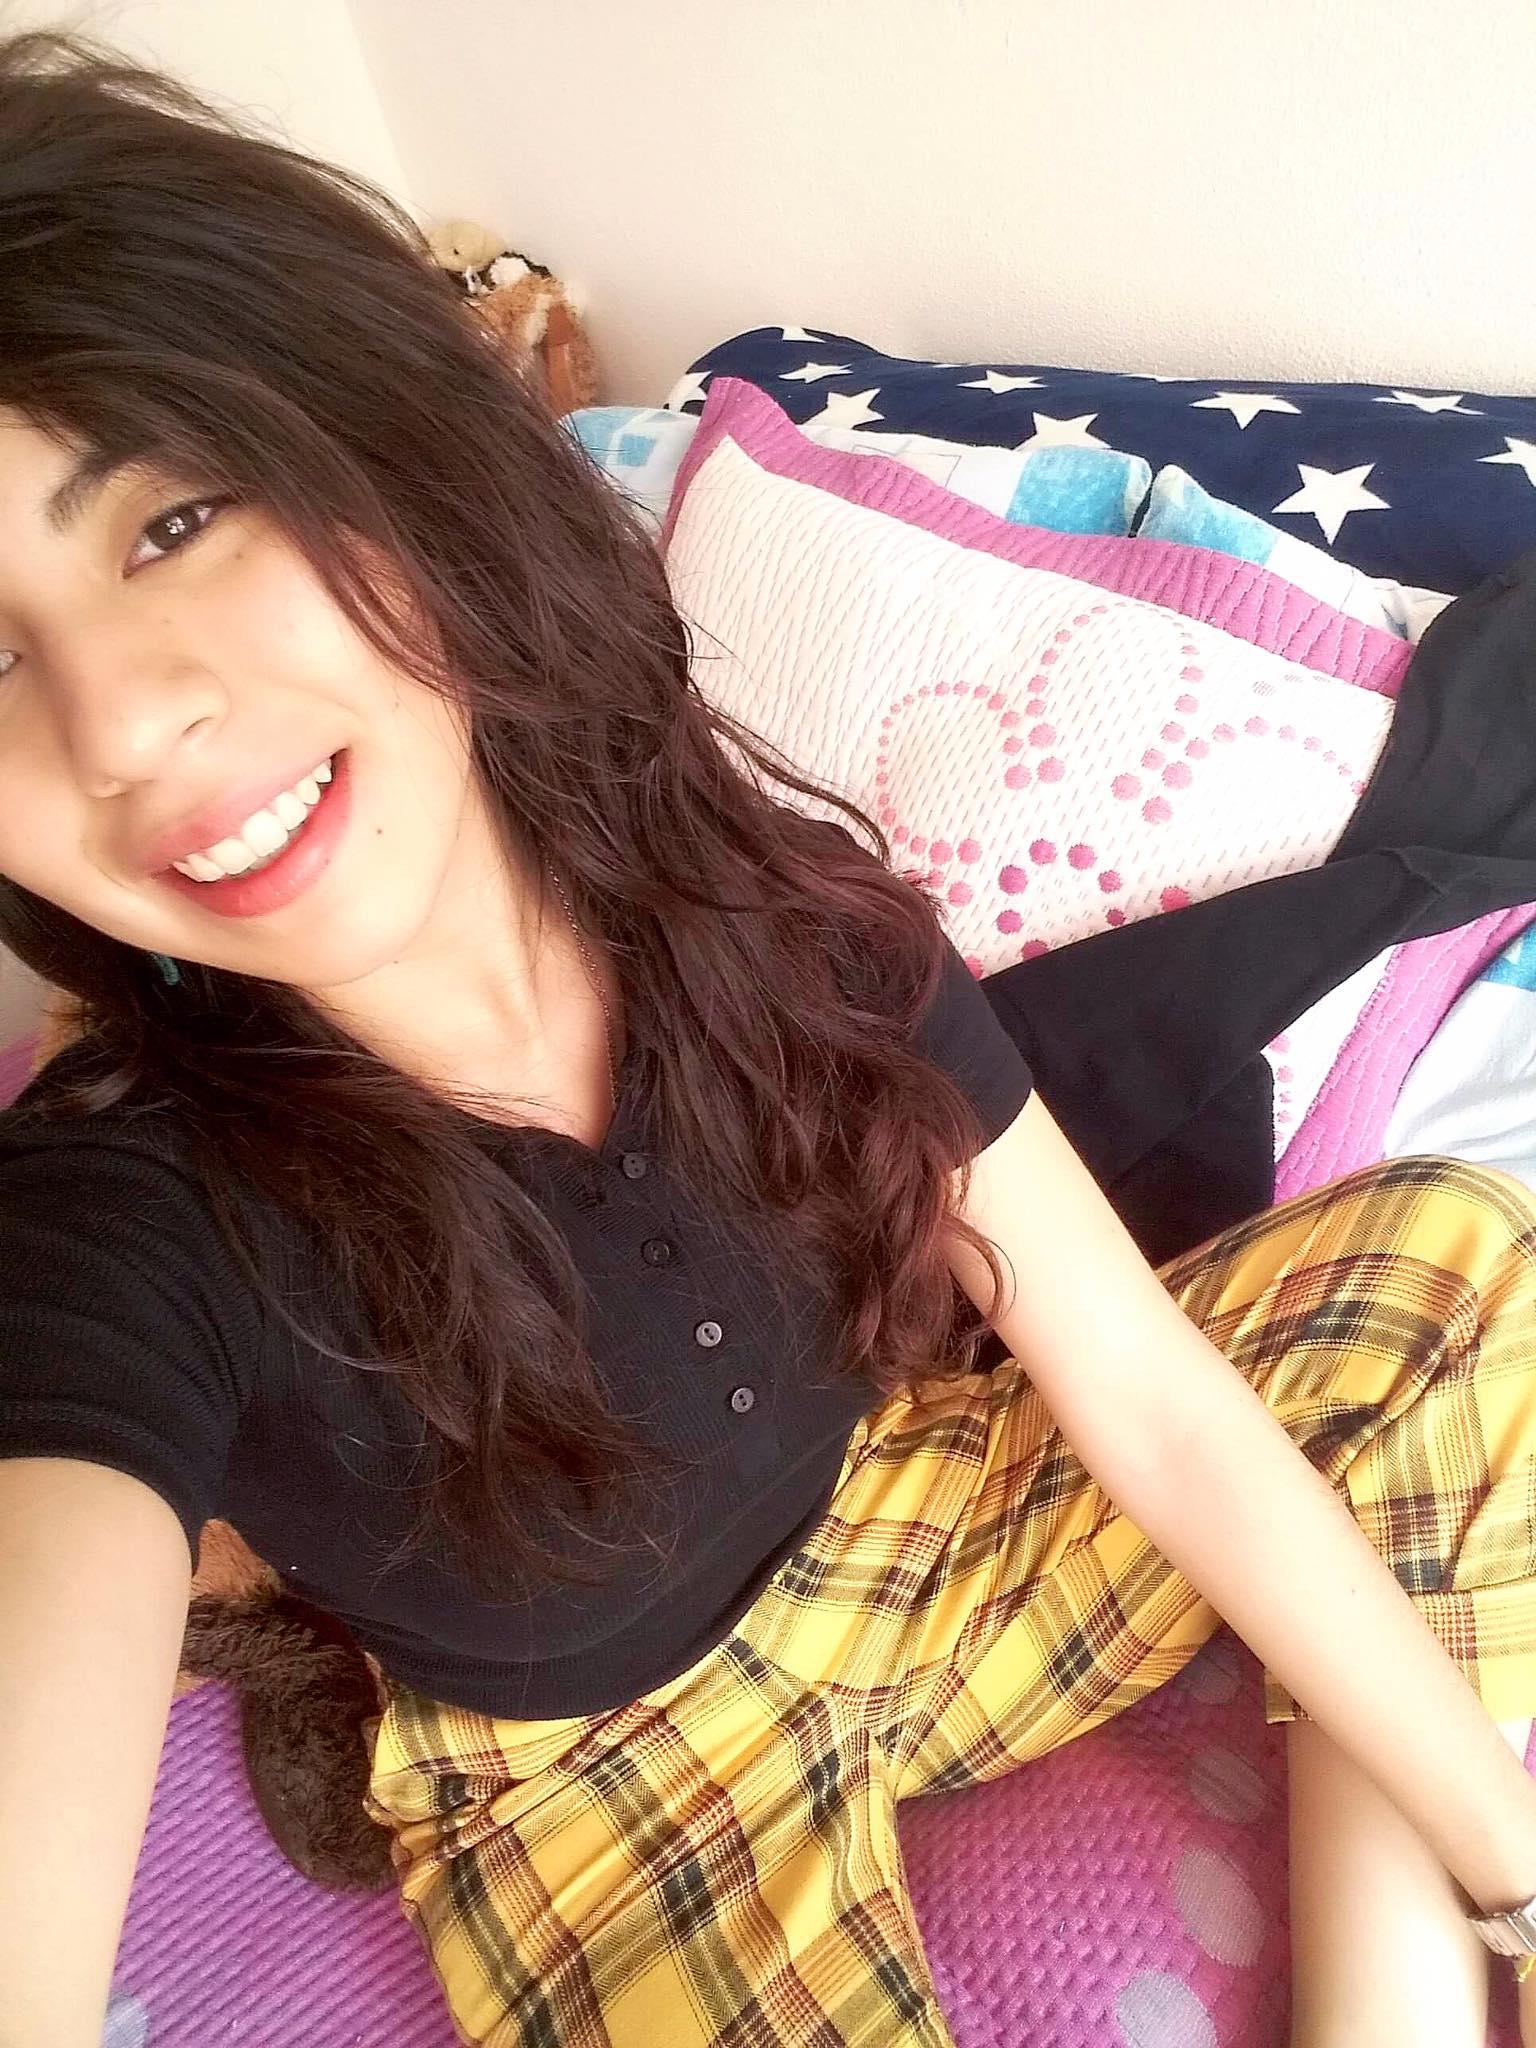 Elena Sandoval